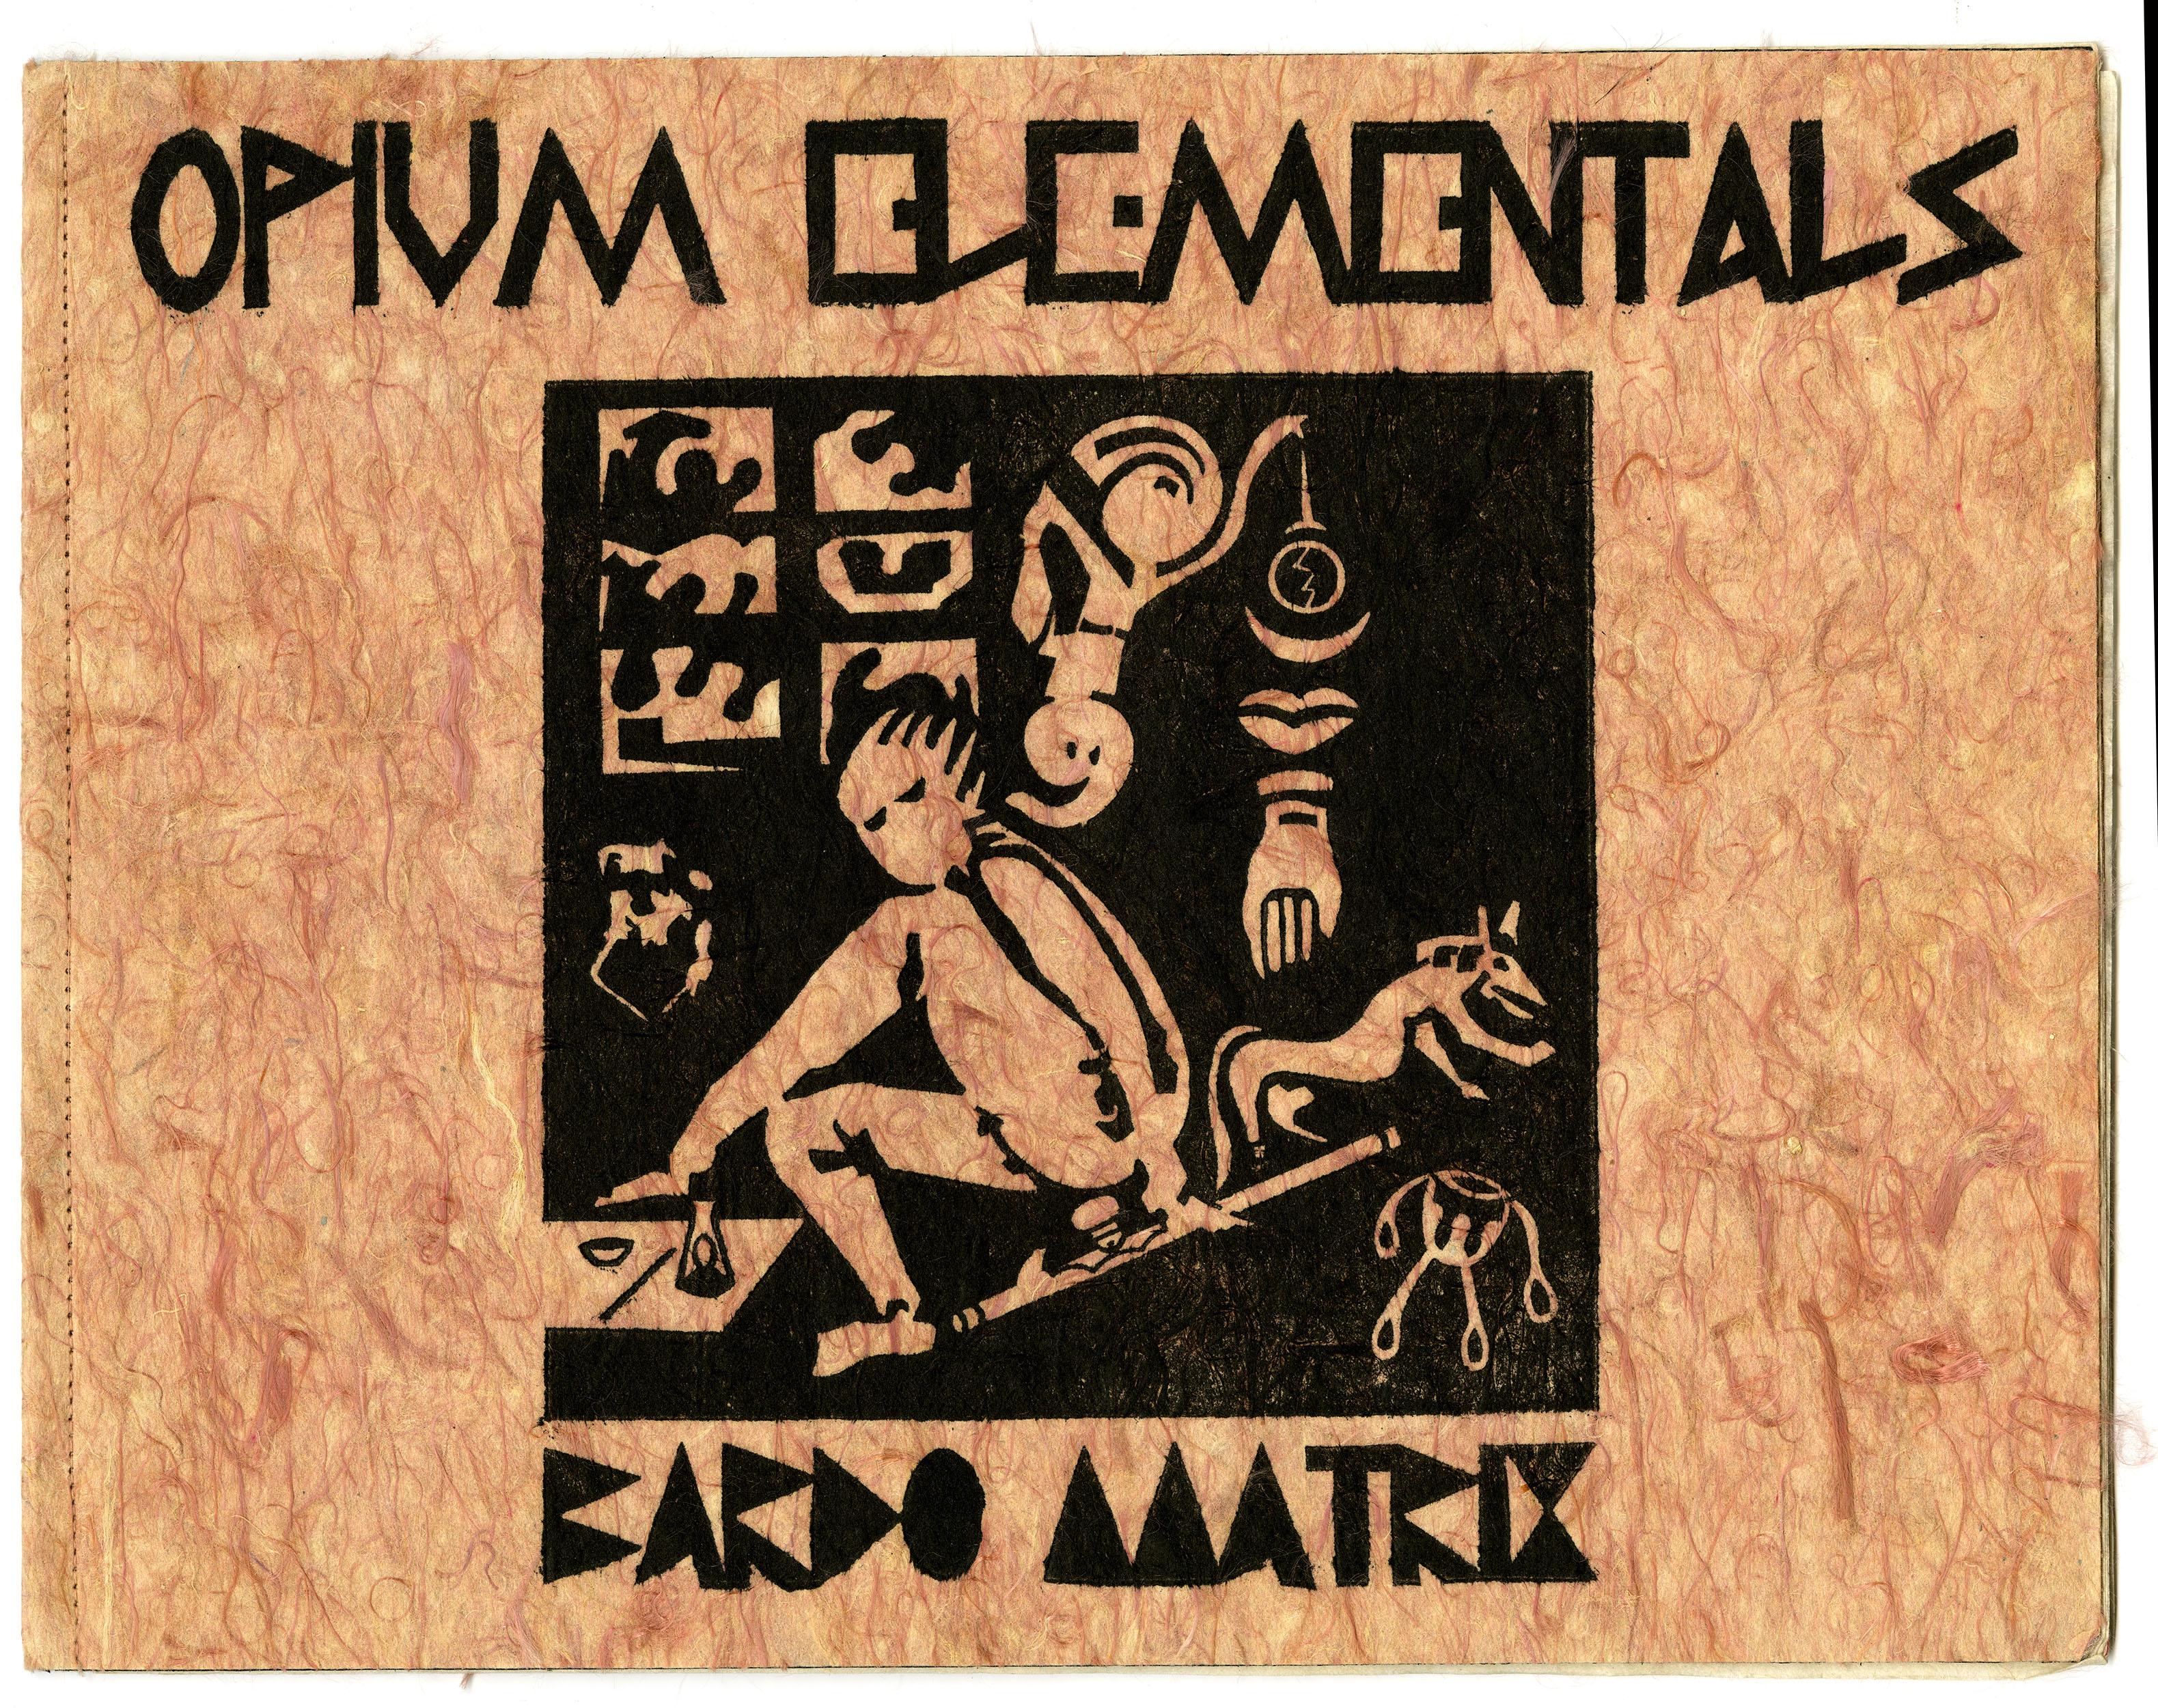 Ira Cohen and Dana Young. Opium Elementals, 1976